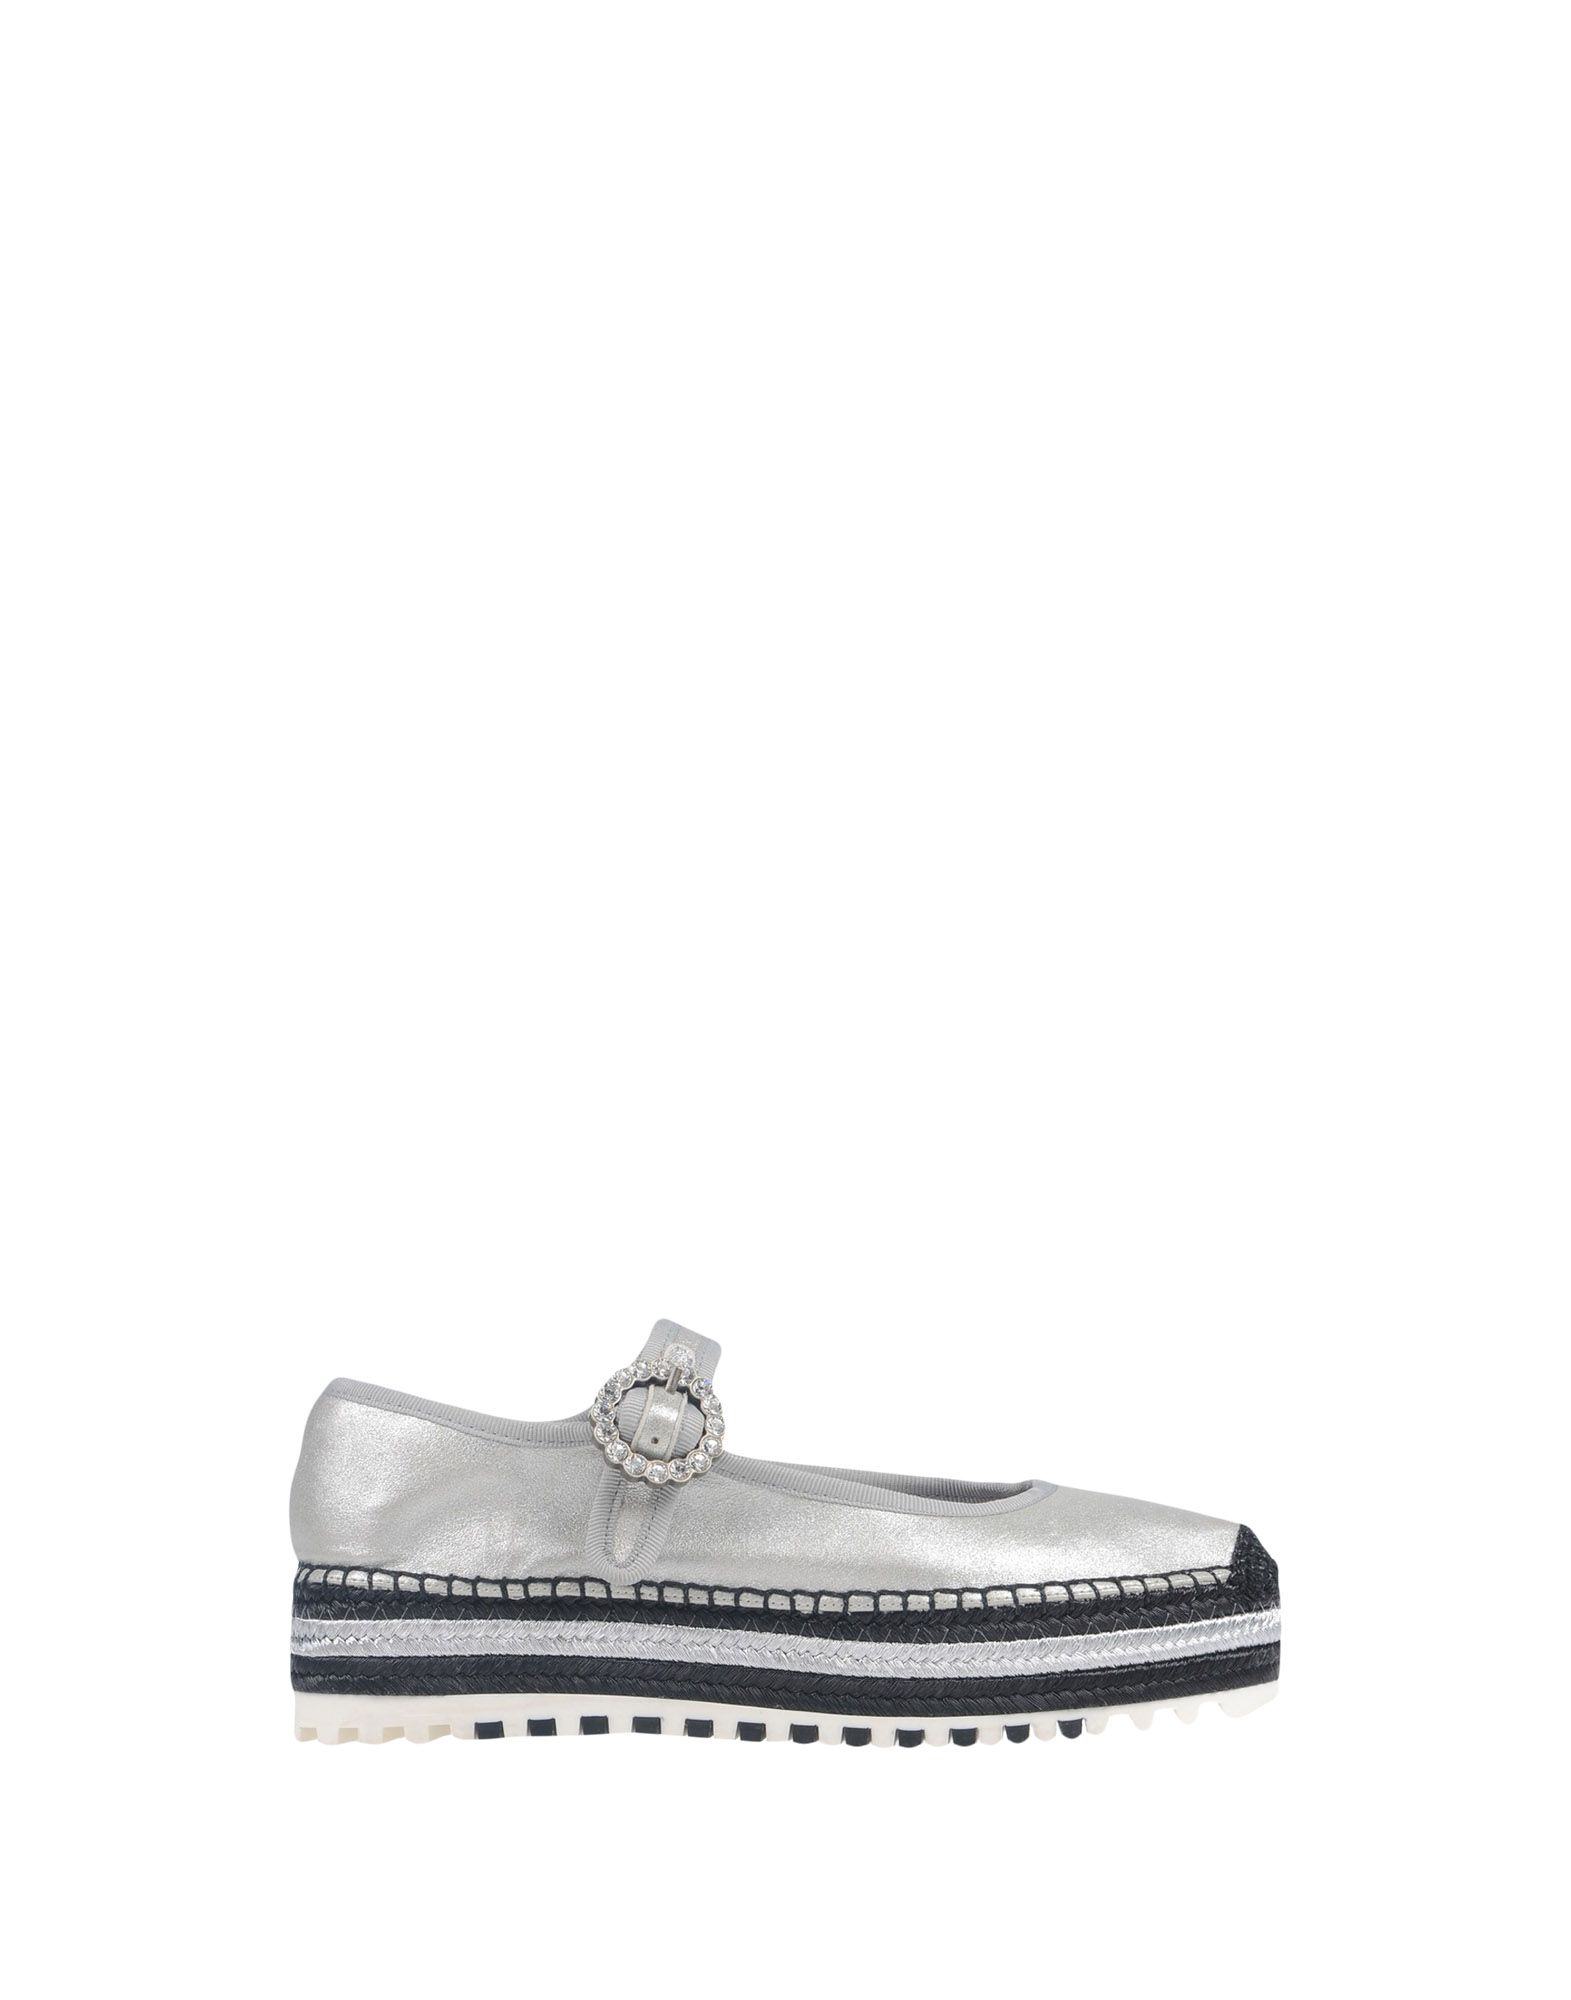 Marc Jacobs Espadrilles Damen Damen Damen  11336258MN Neue Schuhe 7634bb